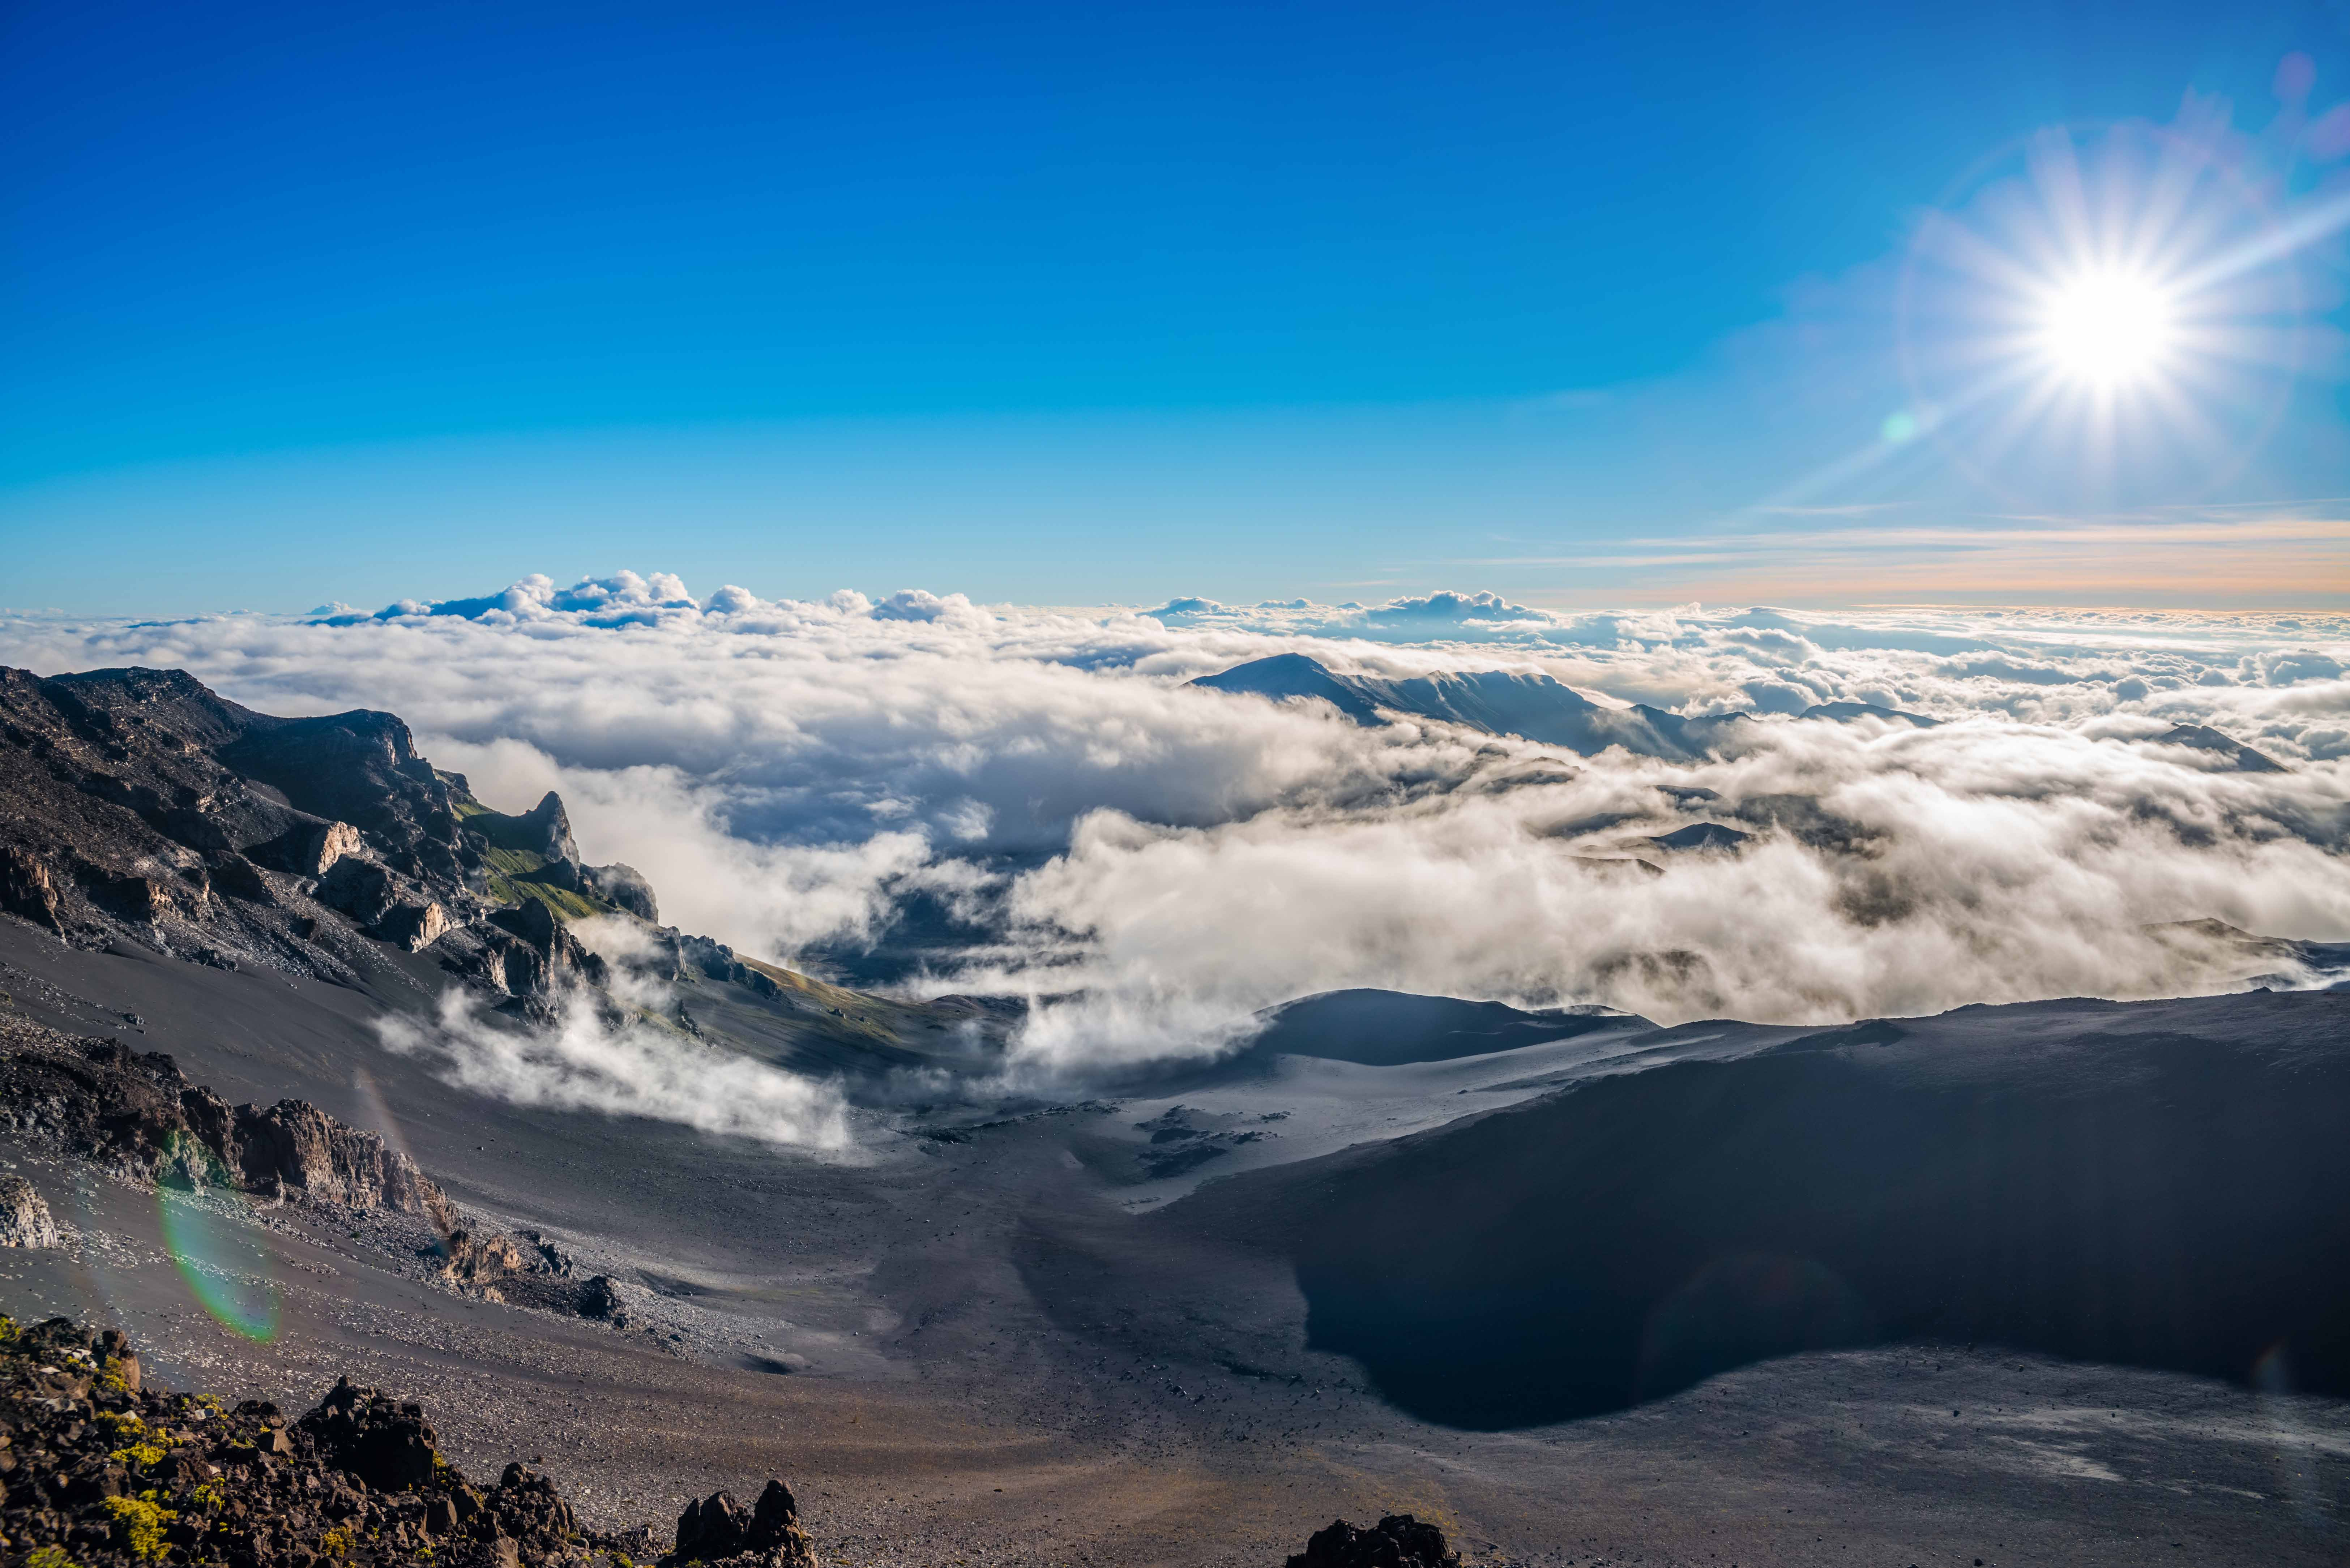 Caldera of the Haleakala volcano, Maui, Hawaii